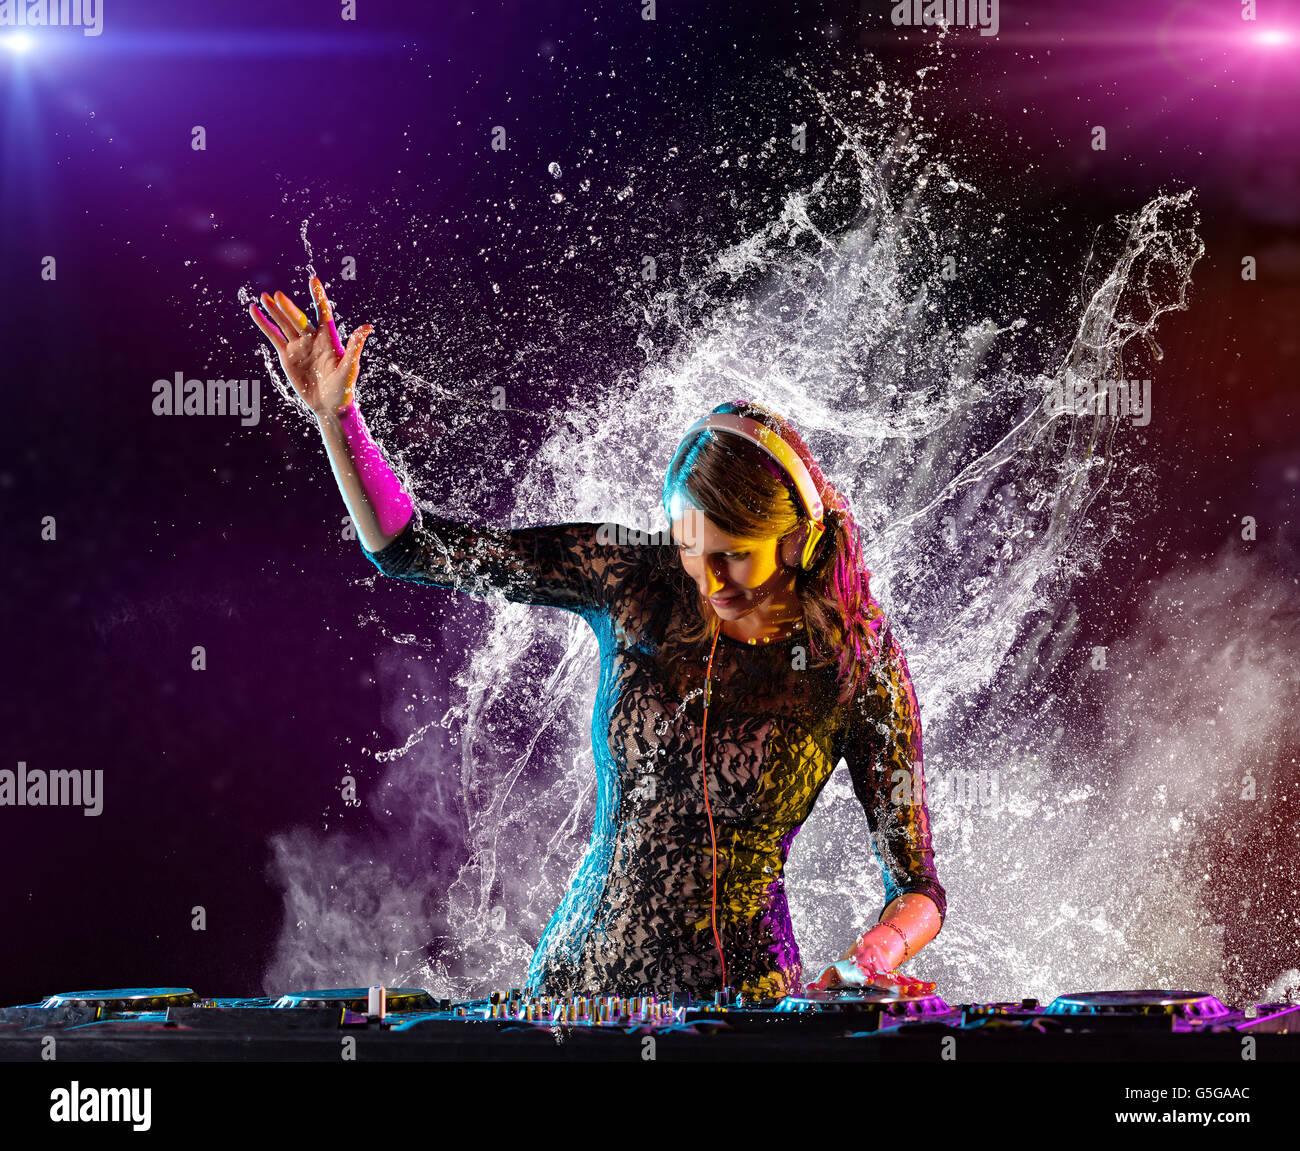 Disc jockey brunette girl mixing electronic music and splashing water around - Stock Image